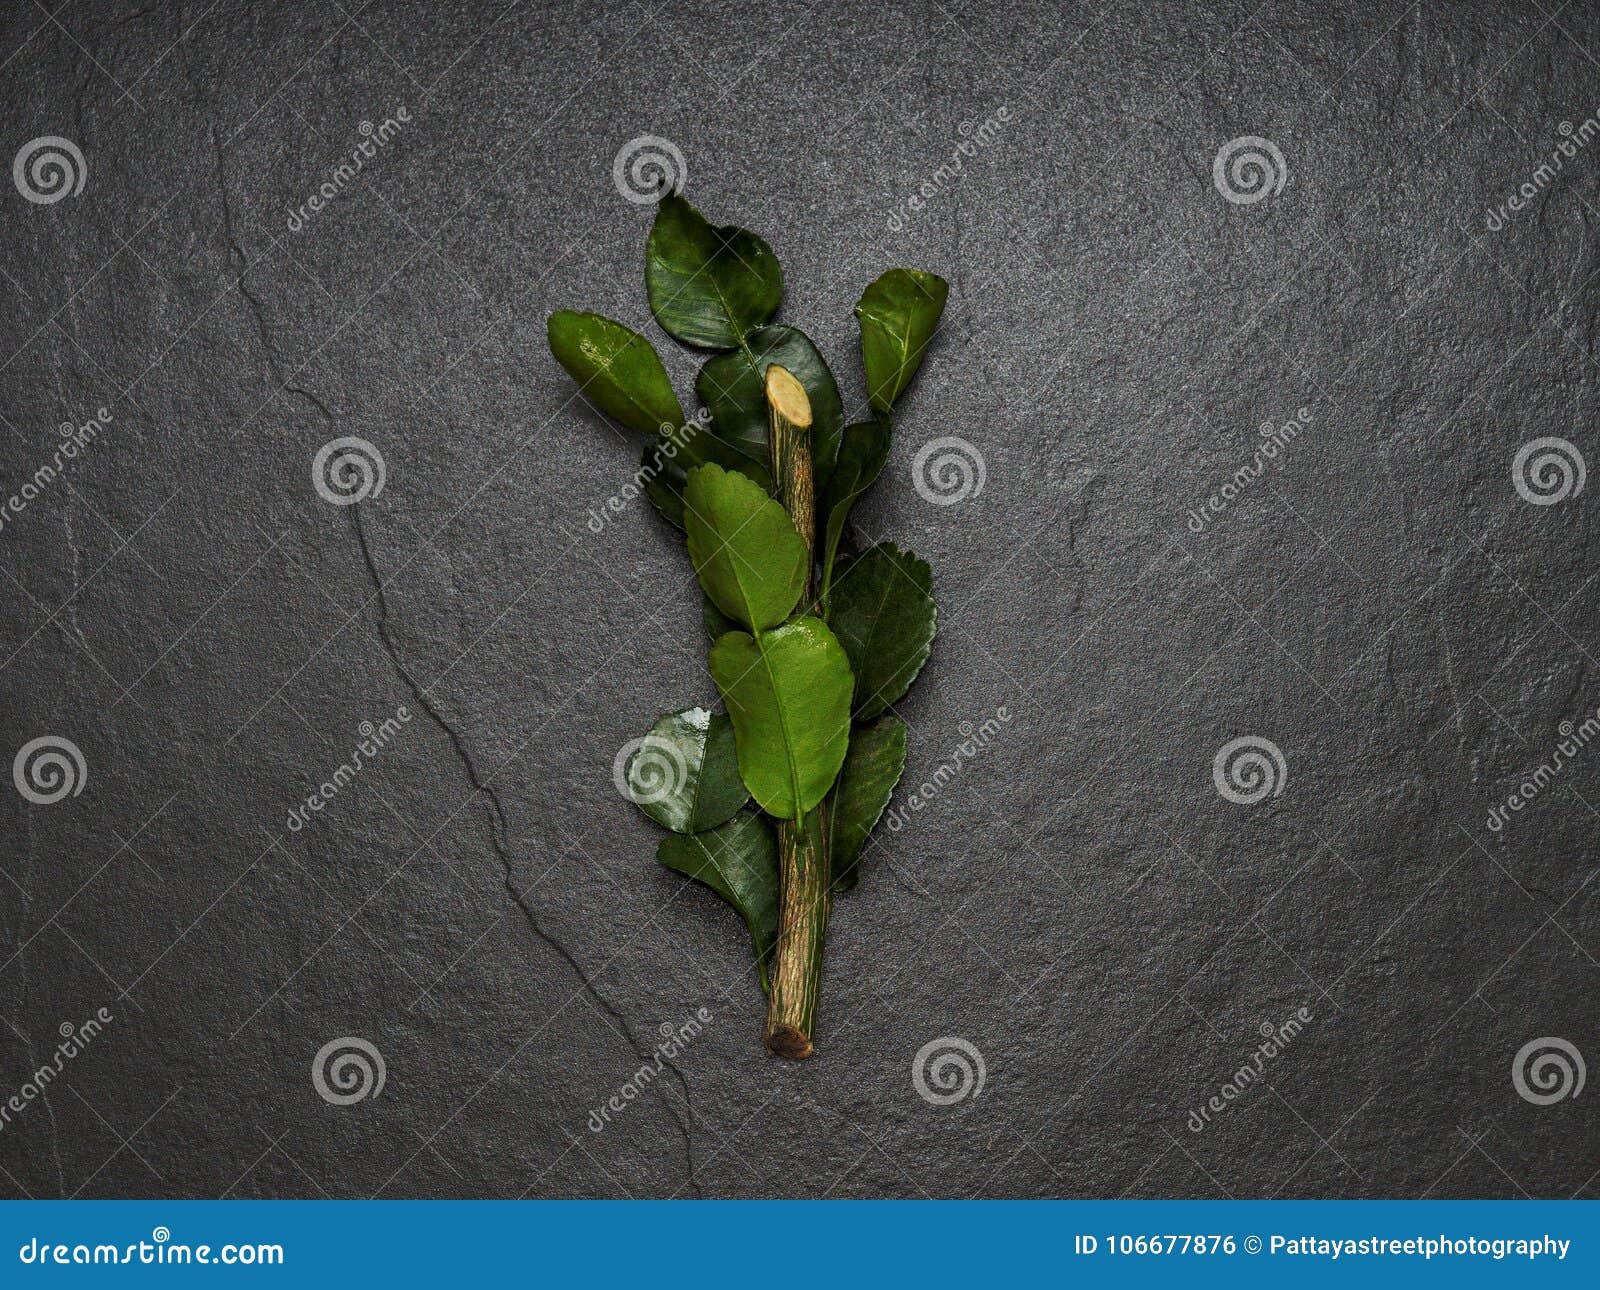 Bergamot, kaffir lime and kaffir lime leaf with branch on dark background